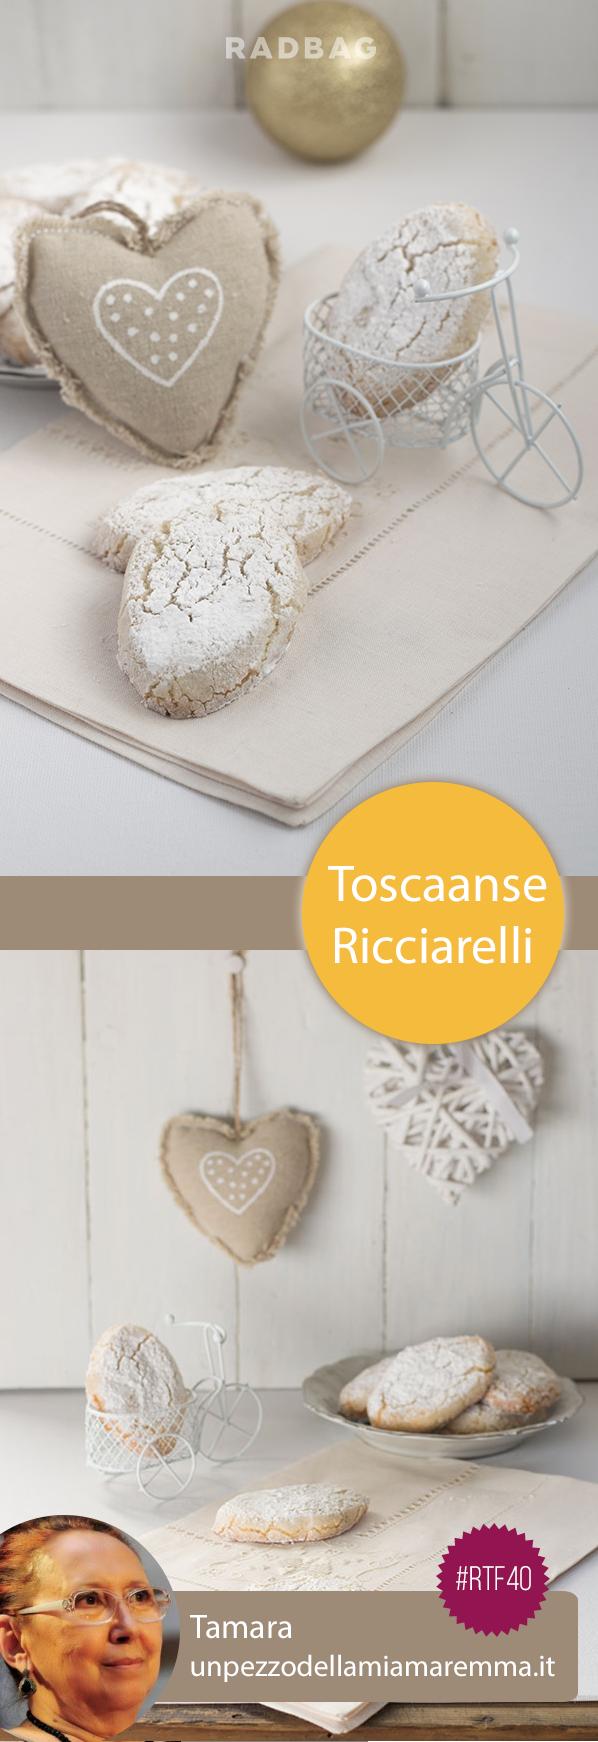 pinnable-image_ricciarelli